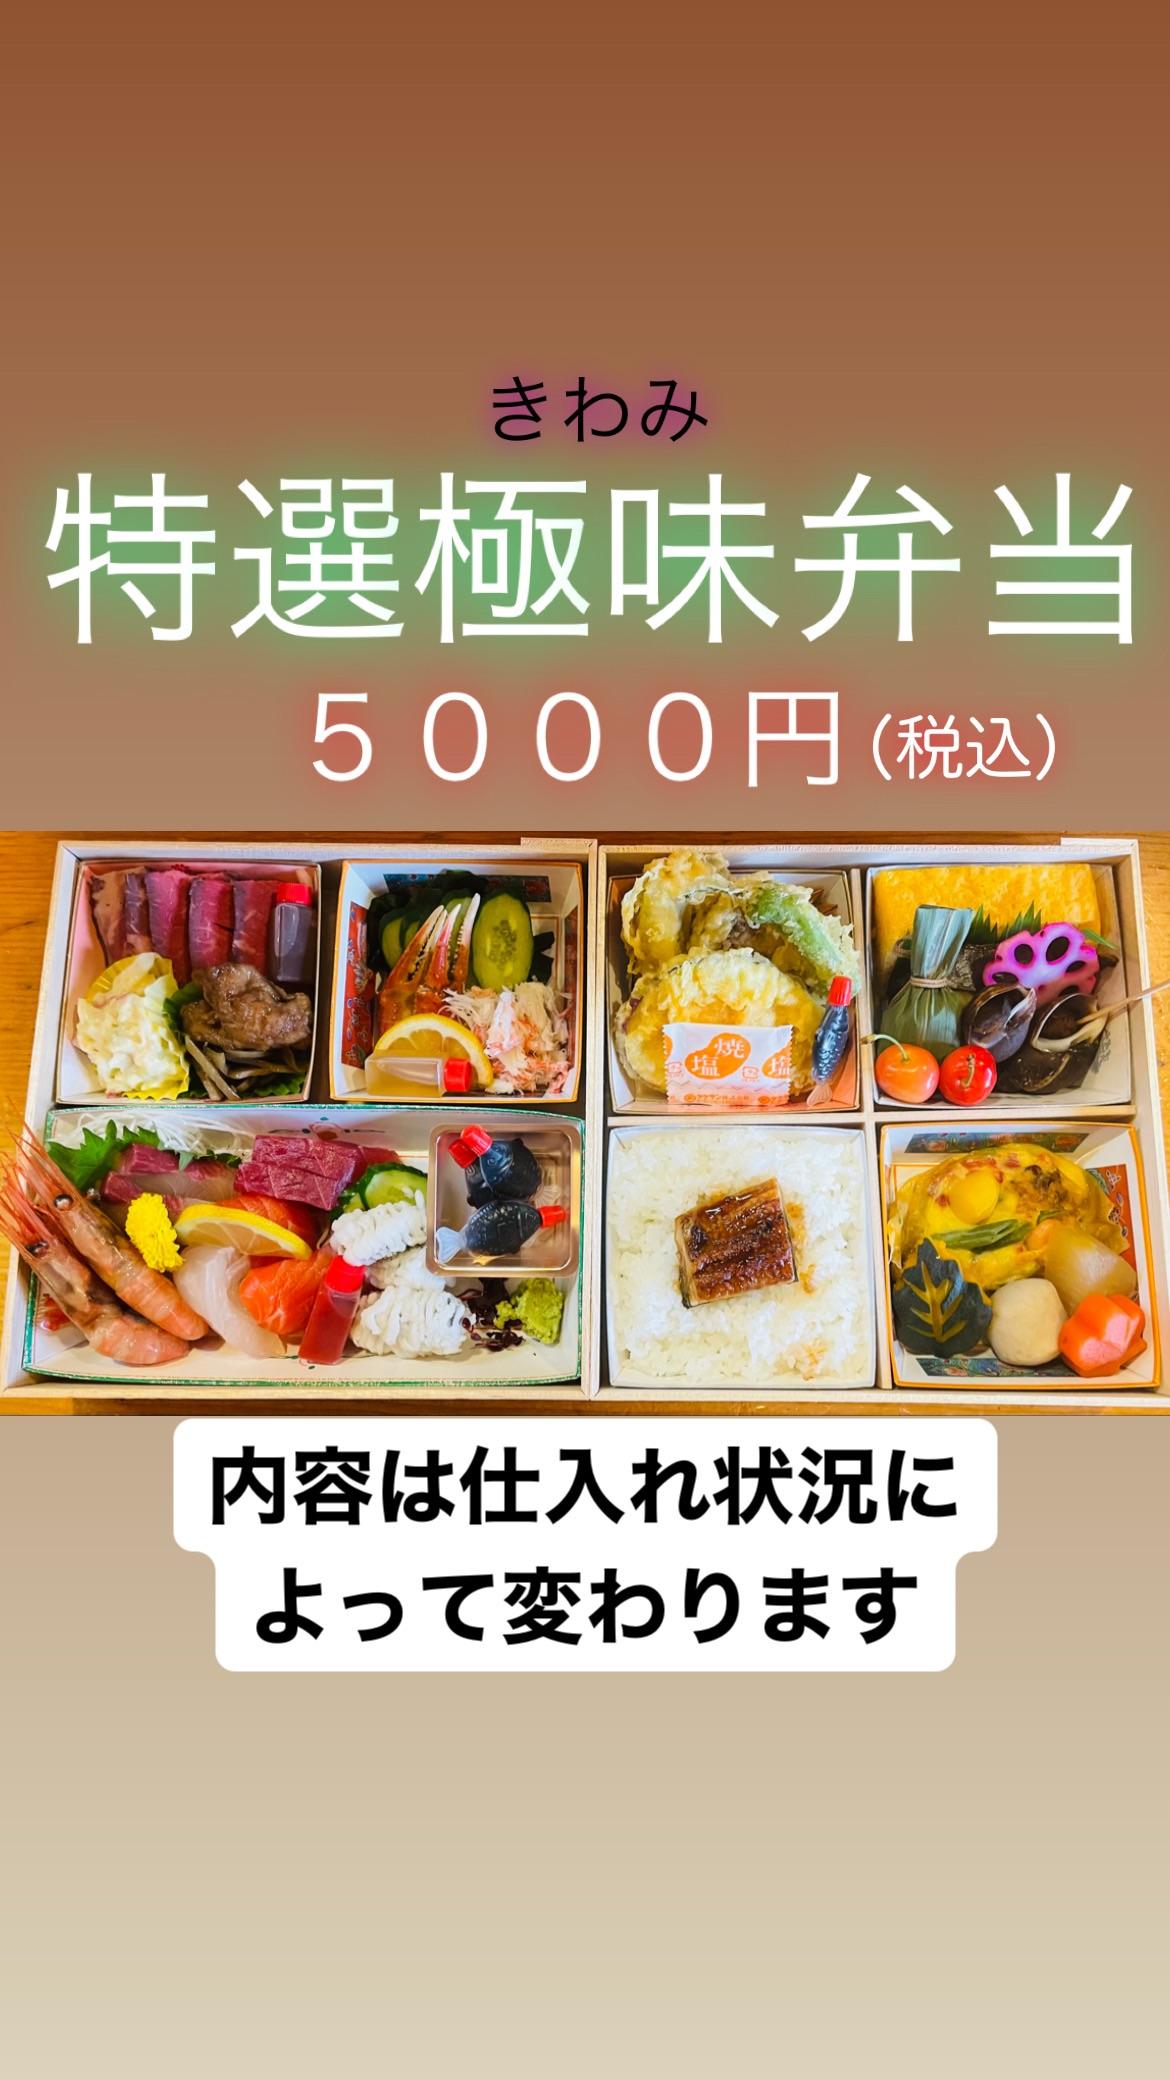 f:id:carp_0301_kenta:20210612200705j:image